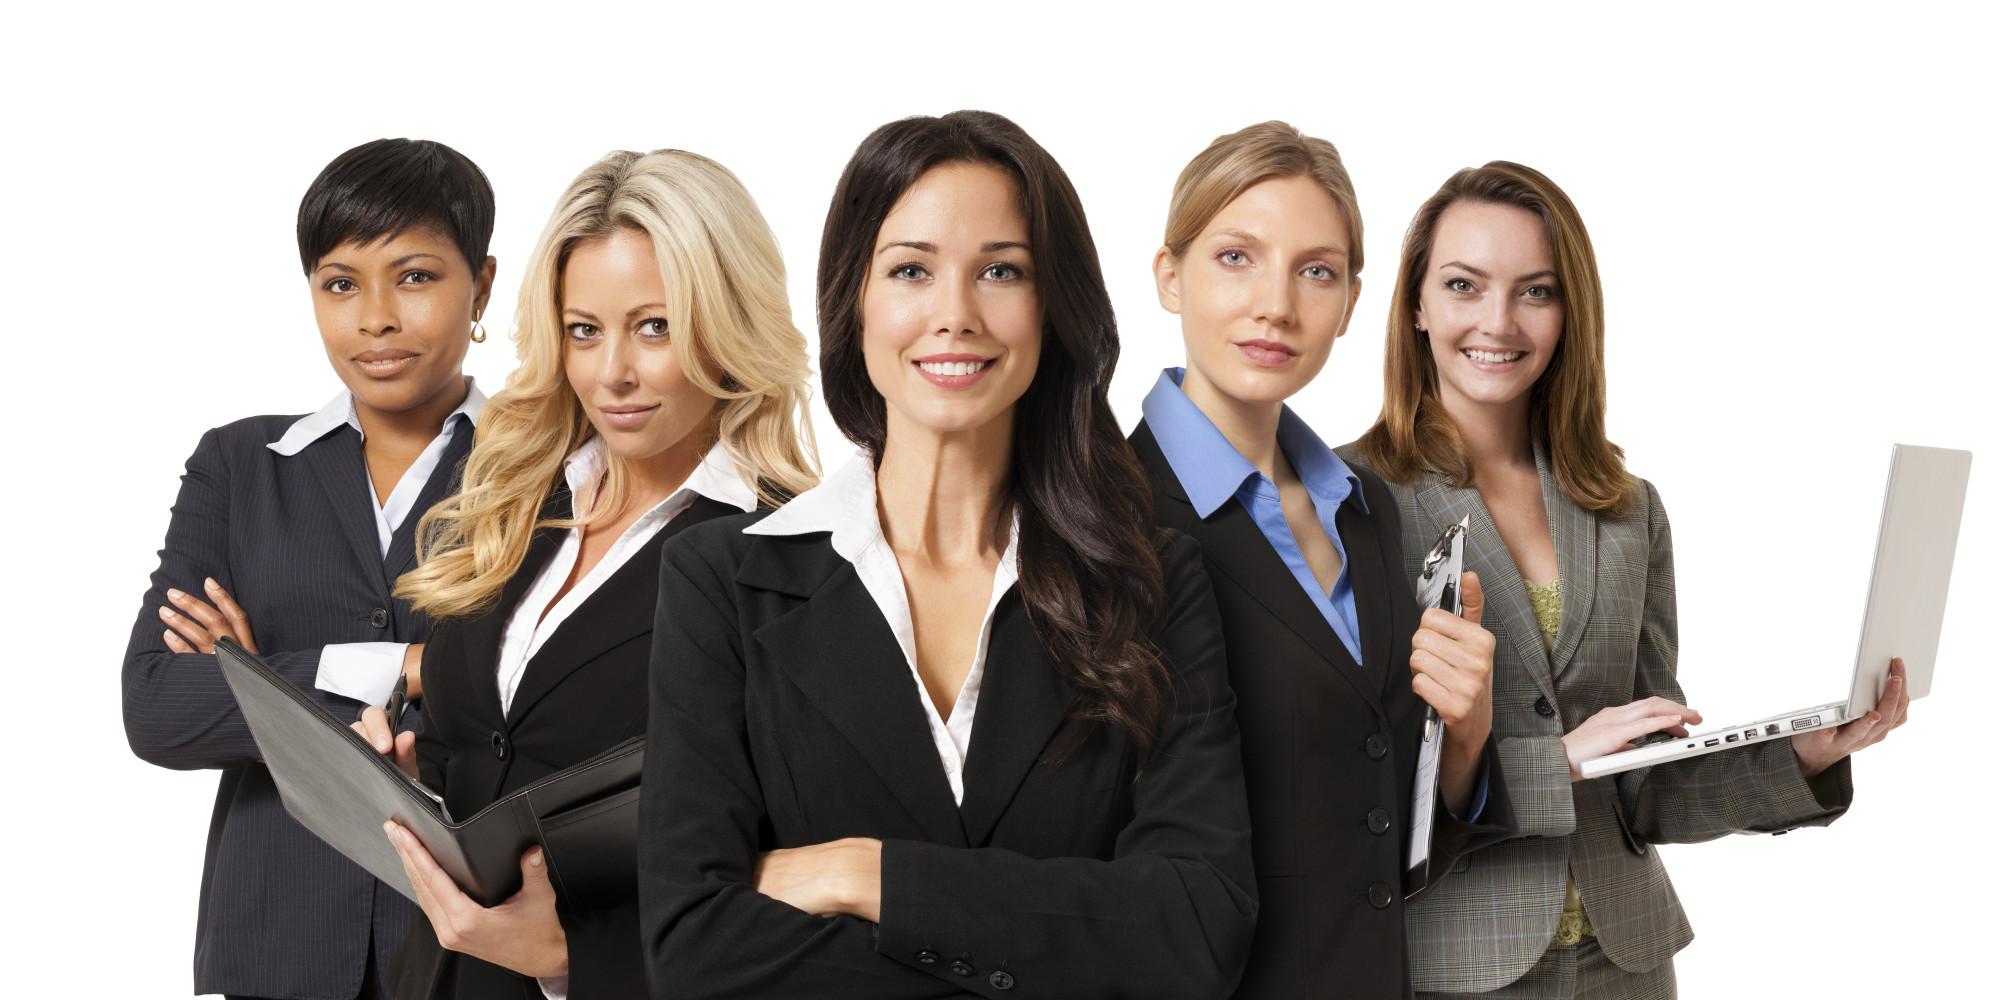 o-GROUP-OF-WOMEN-facebook.jpg